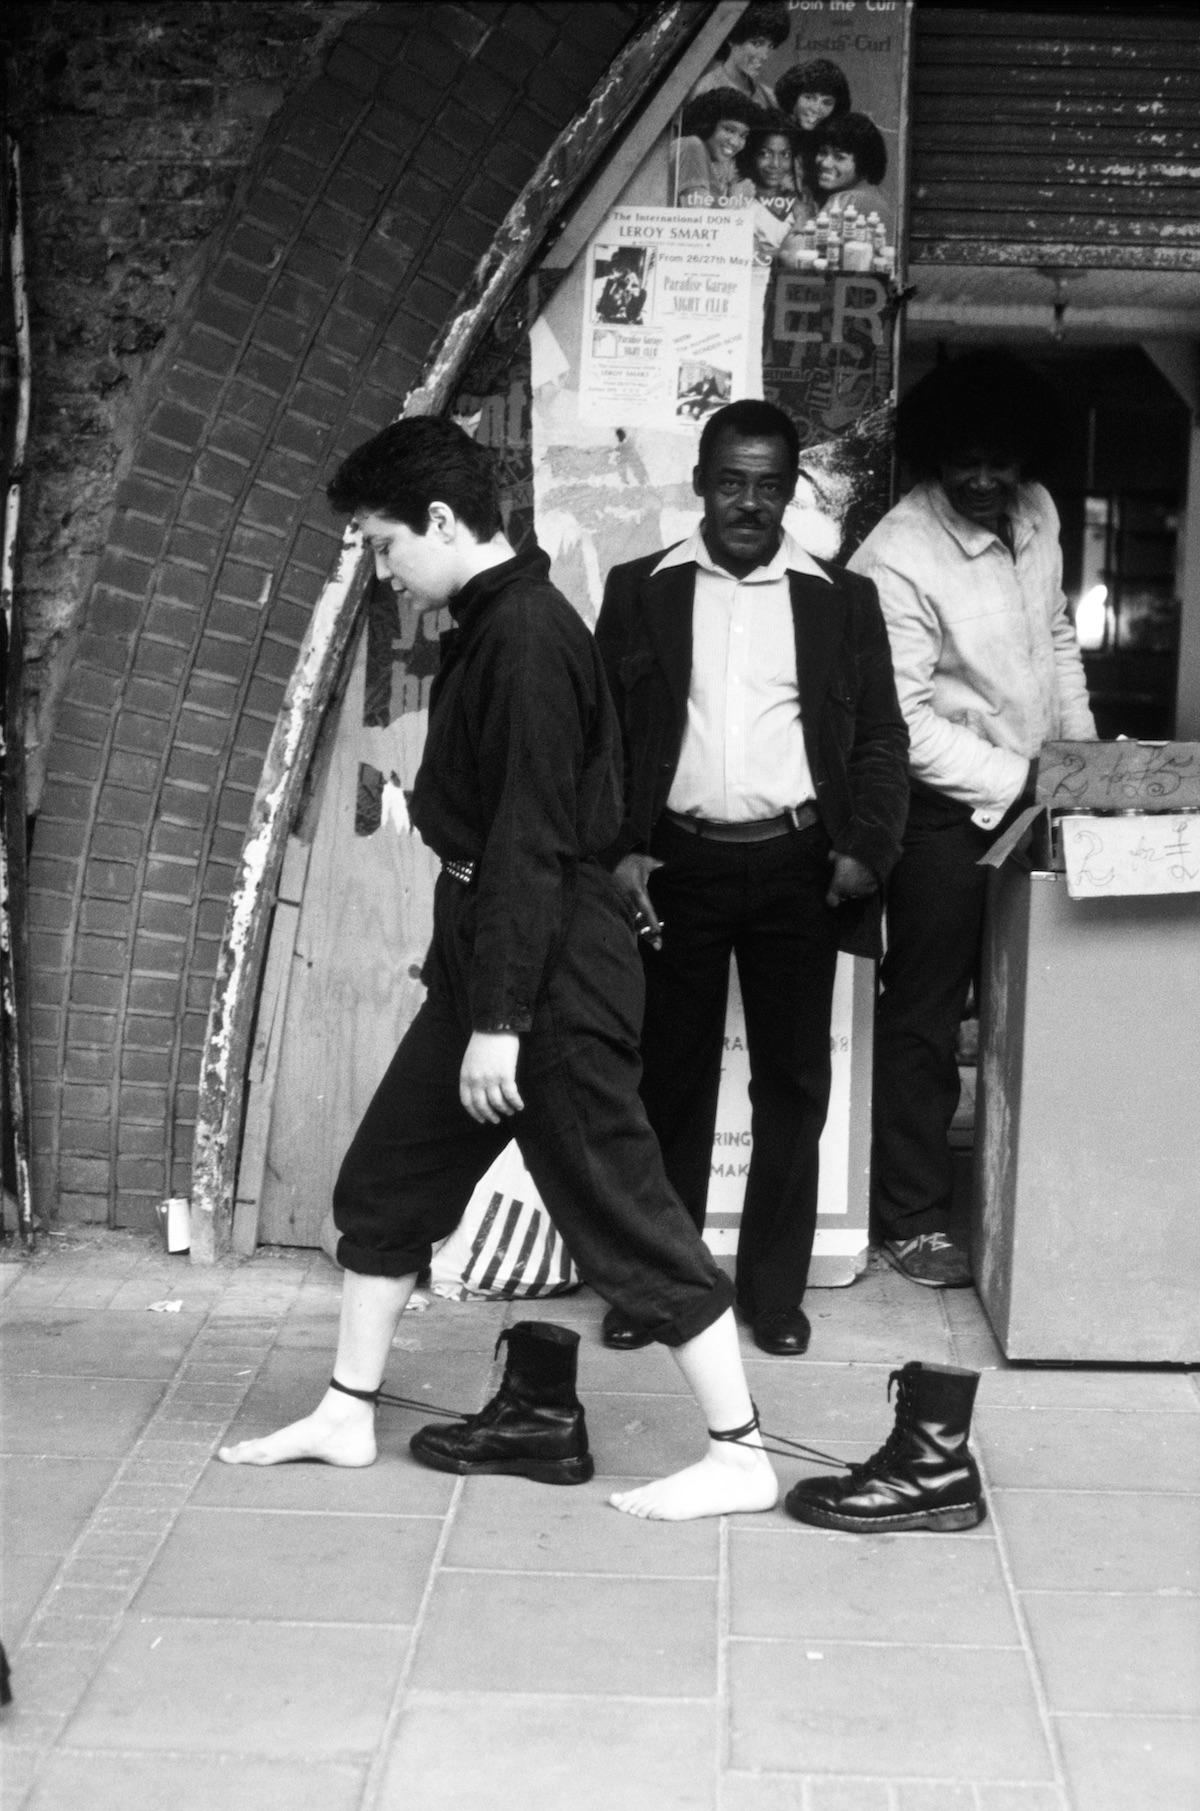 Mona Hatoum, Roadworks, 1985, Live action with Dr Martens boots, Performed in Brixton, London © Mona Hatoum. Courtesy Brixton Art Gallery (Photo: Patrick Gilbert)